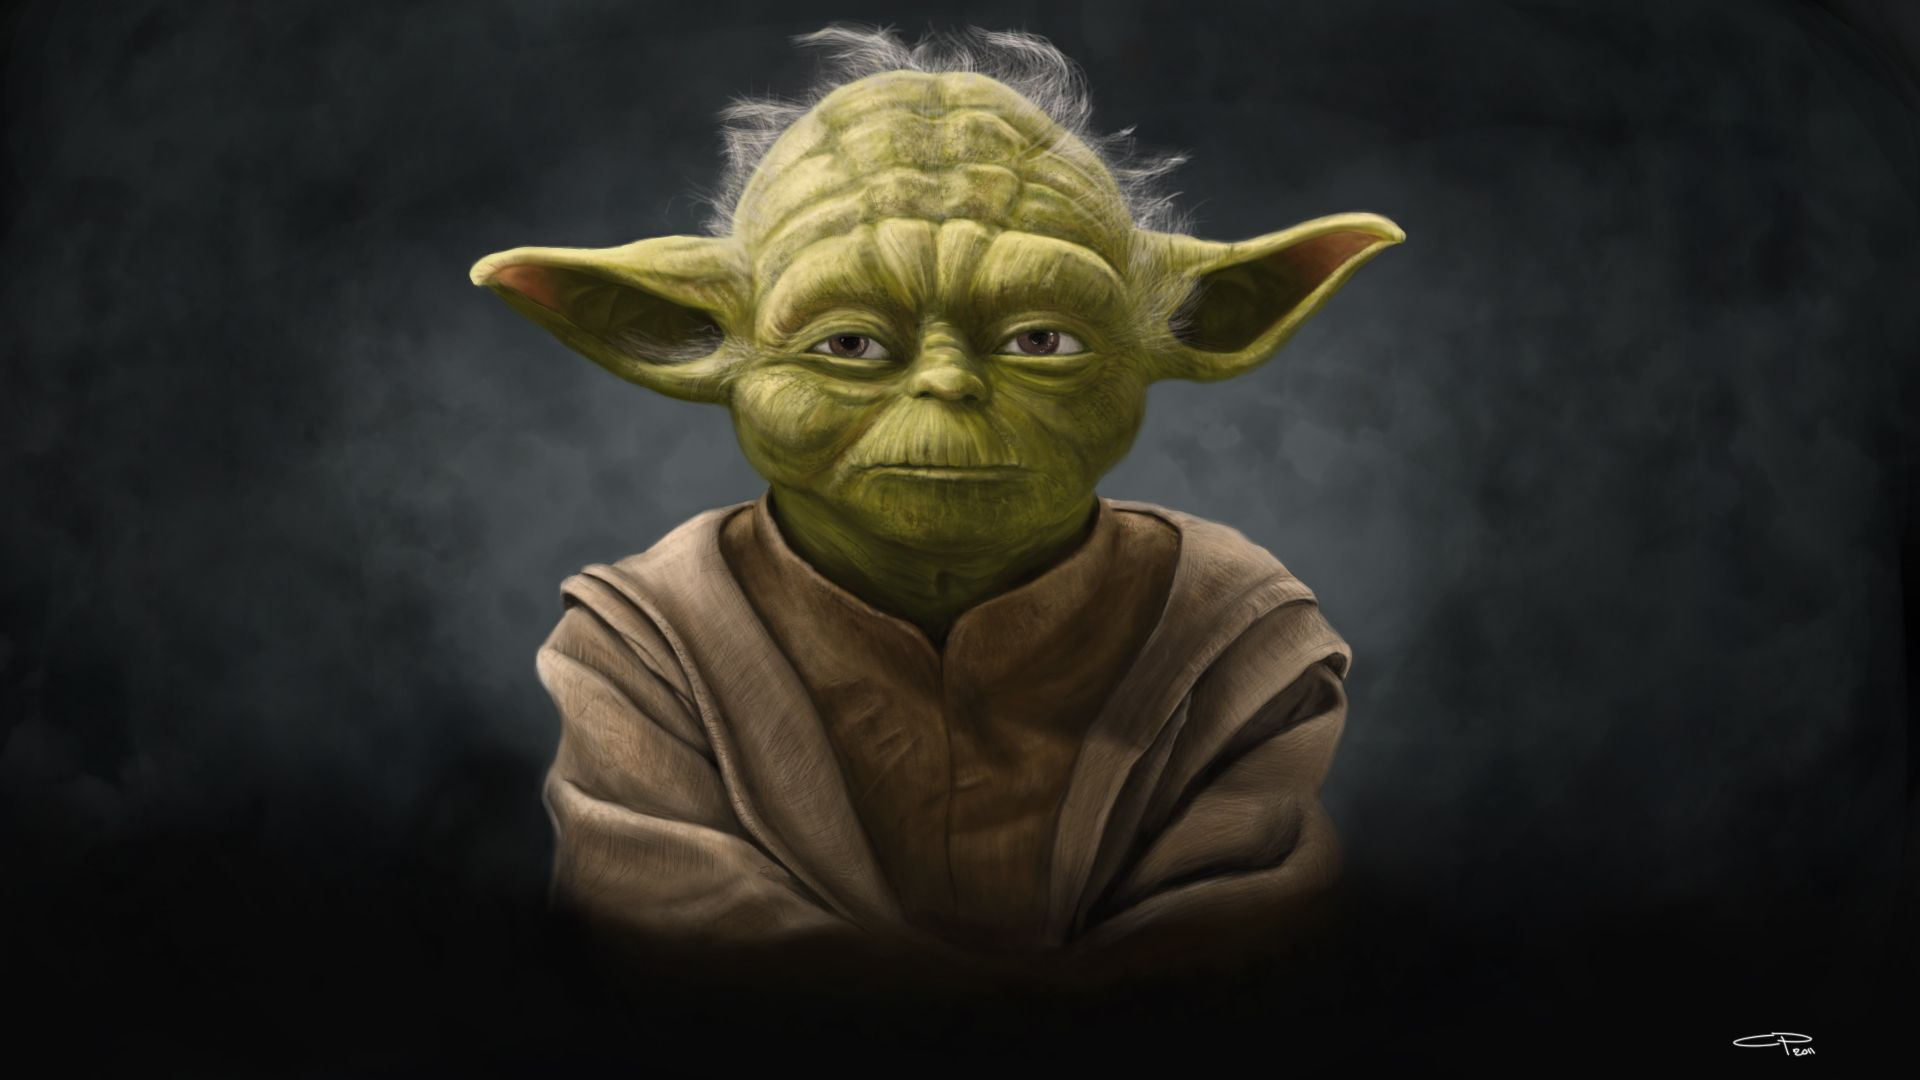 Yoda Wallpapers Wallpaperup Hd Wallpapers Cool Wallpaper Hd Wallpaper Wallpaper